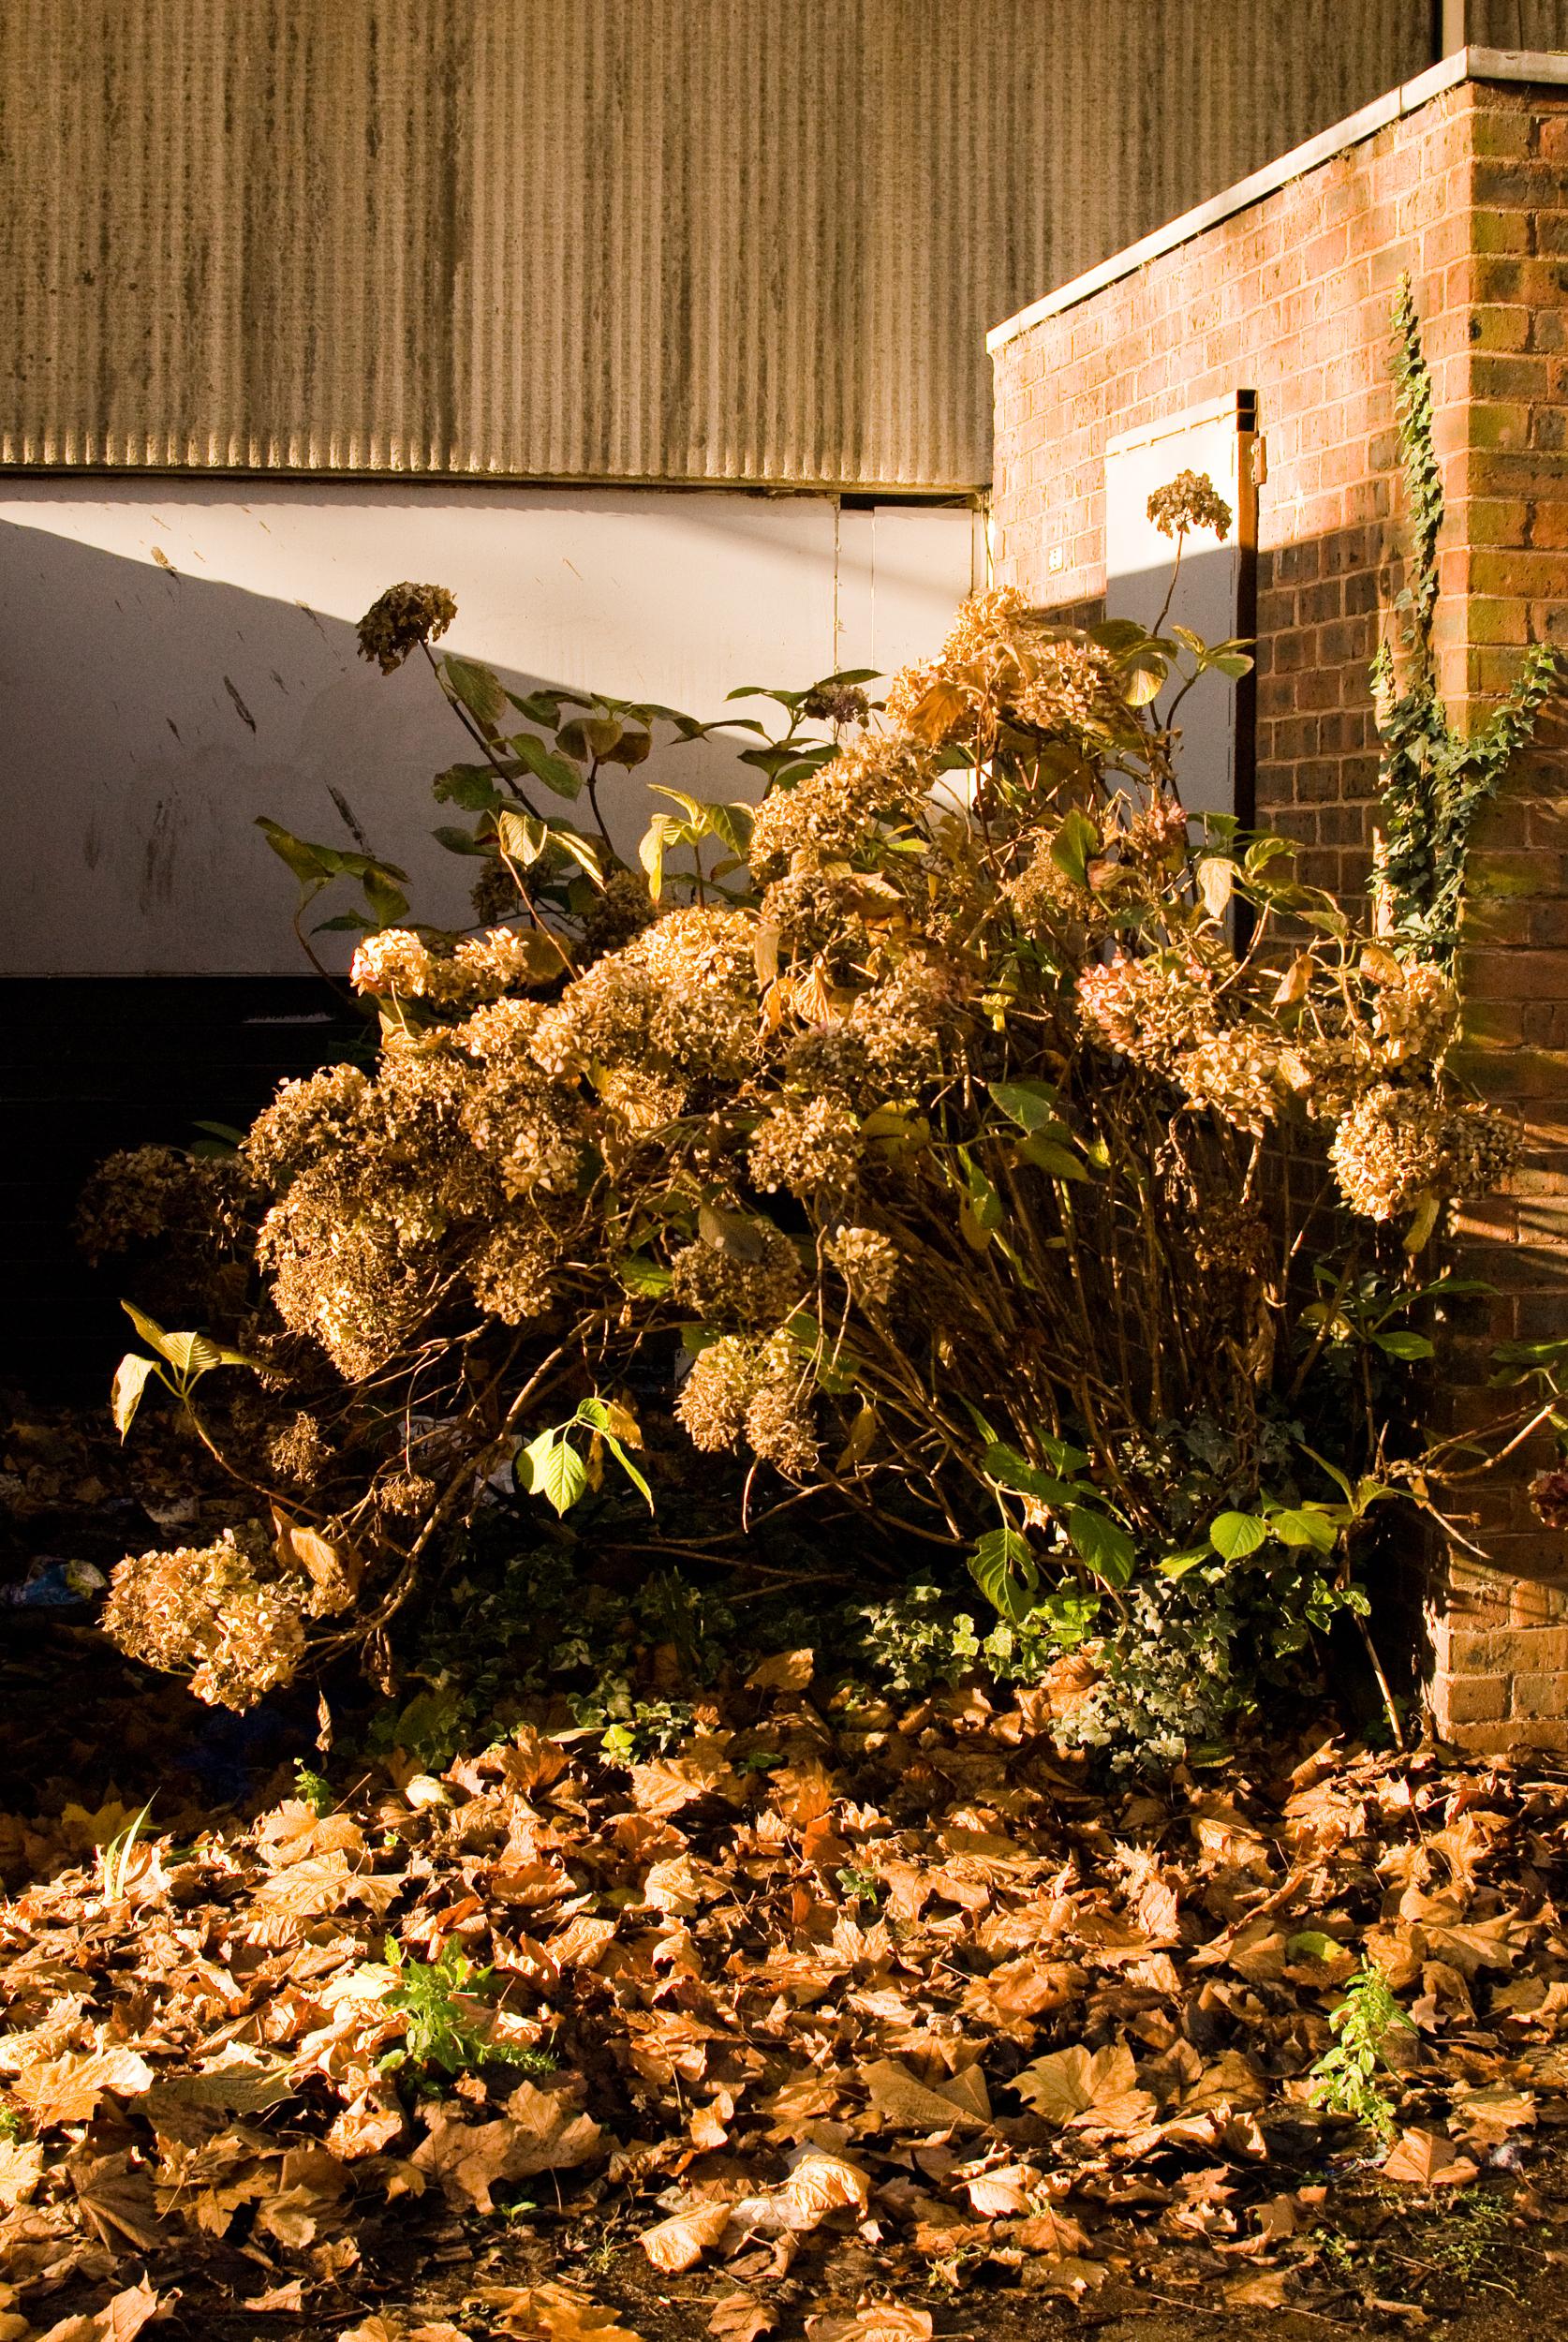 Georgina_cook_Heygate_estate_garden.jpg